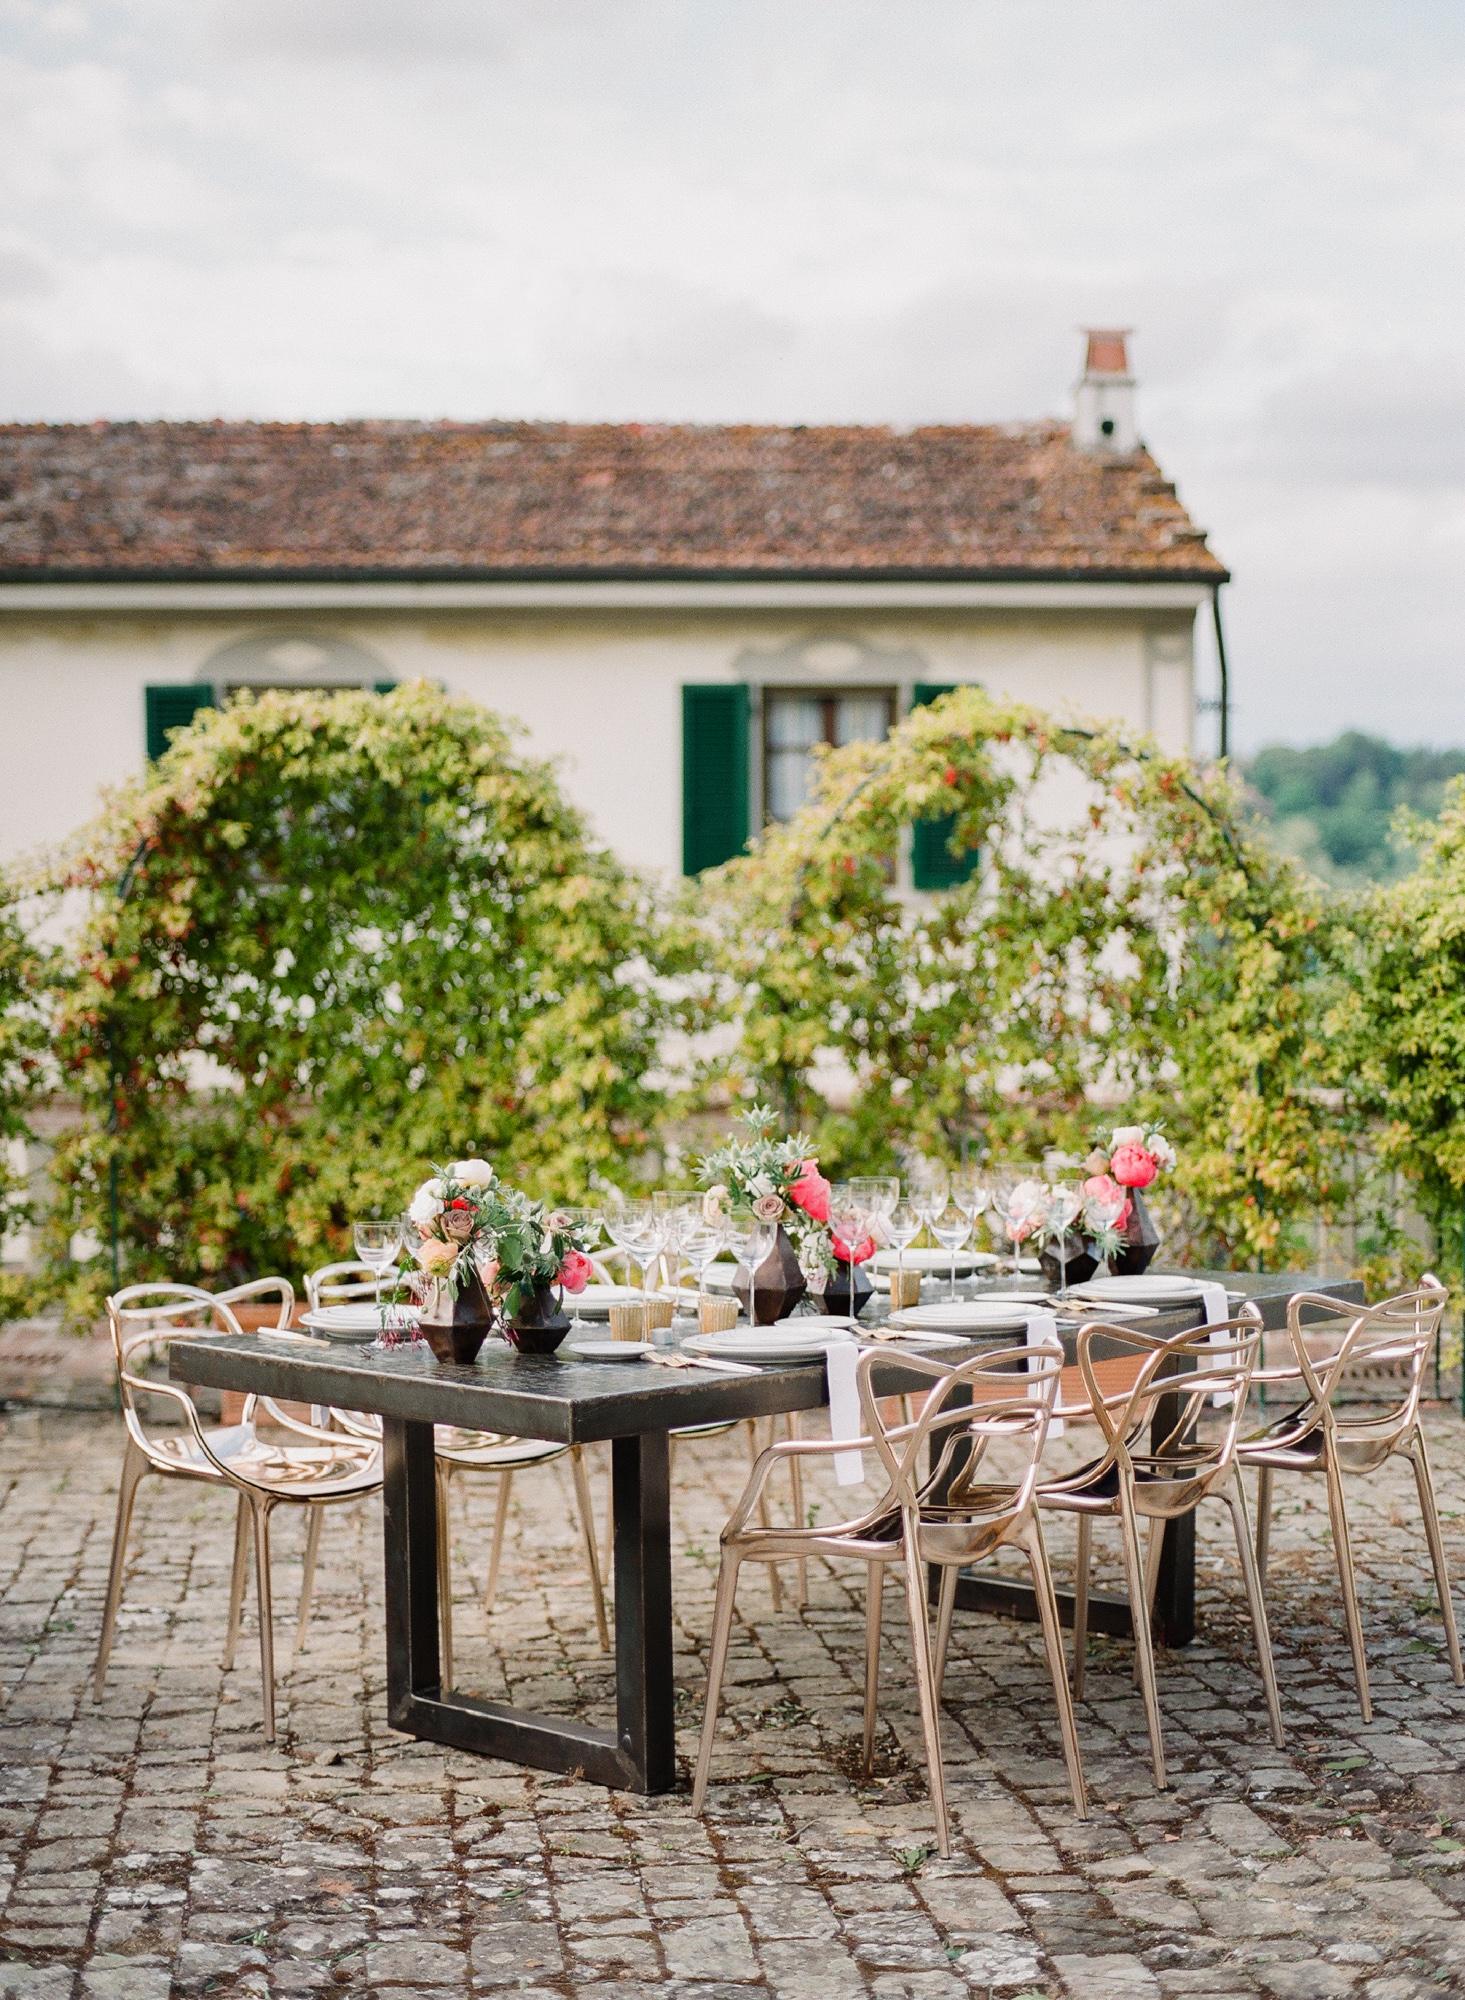 Tuscany-Wedding-Venues-44.jpg